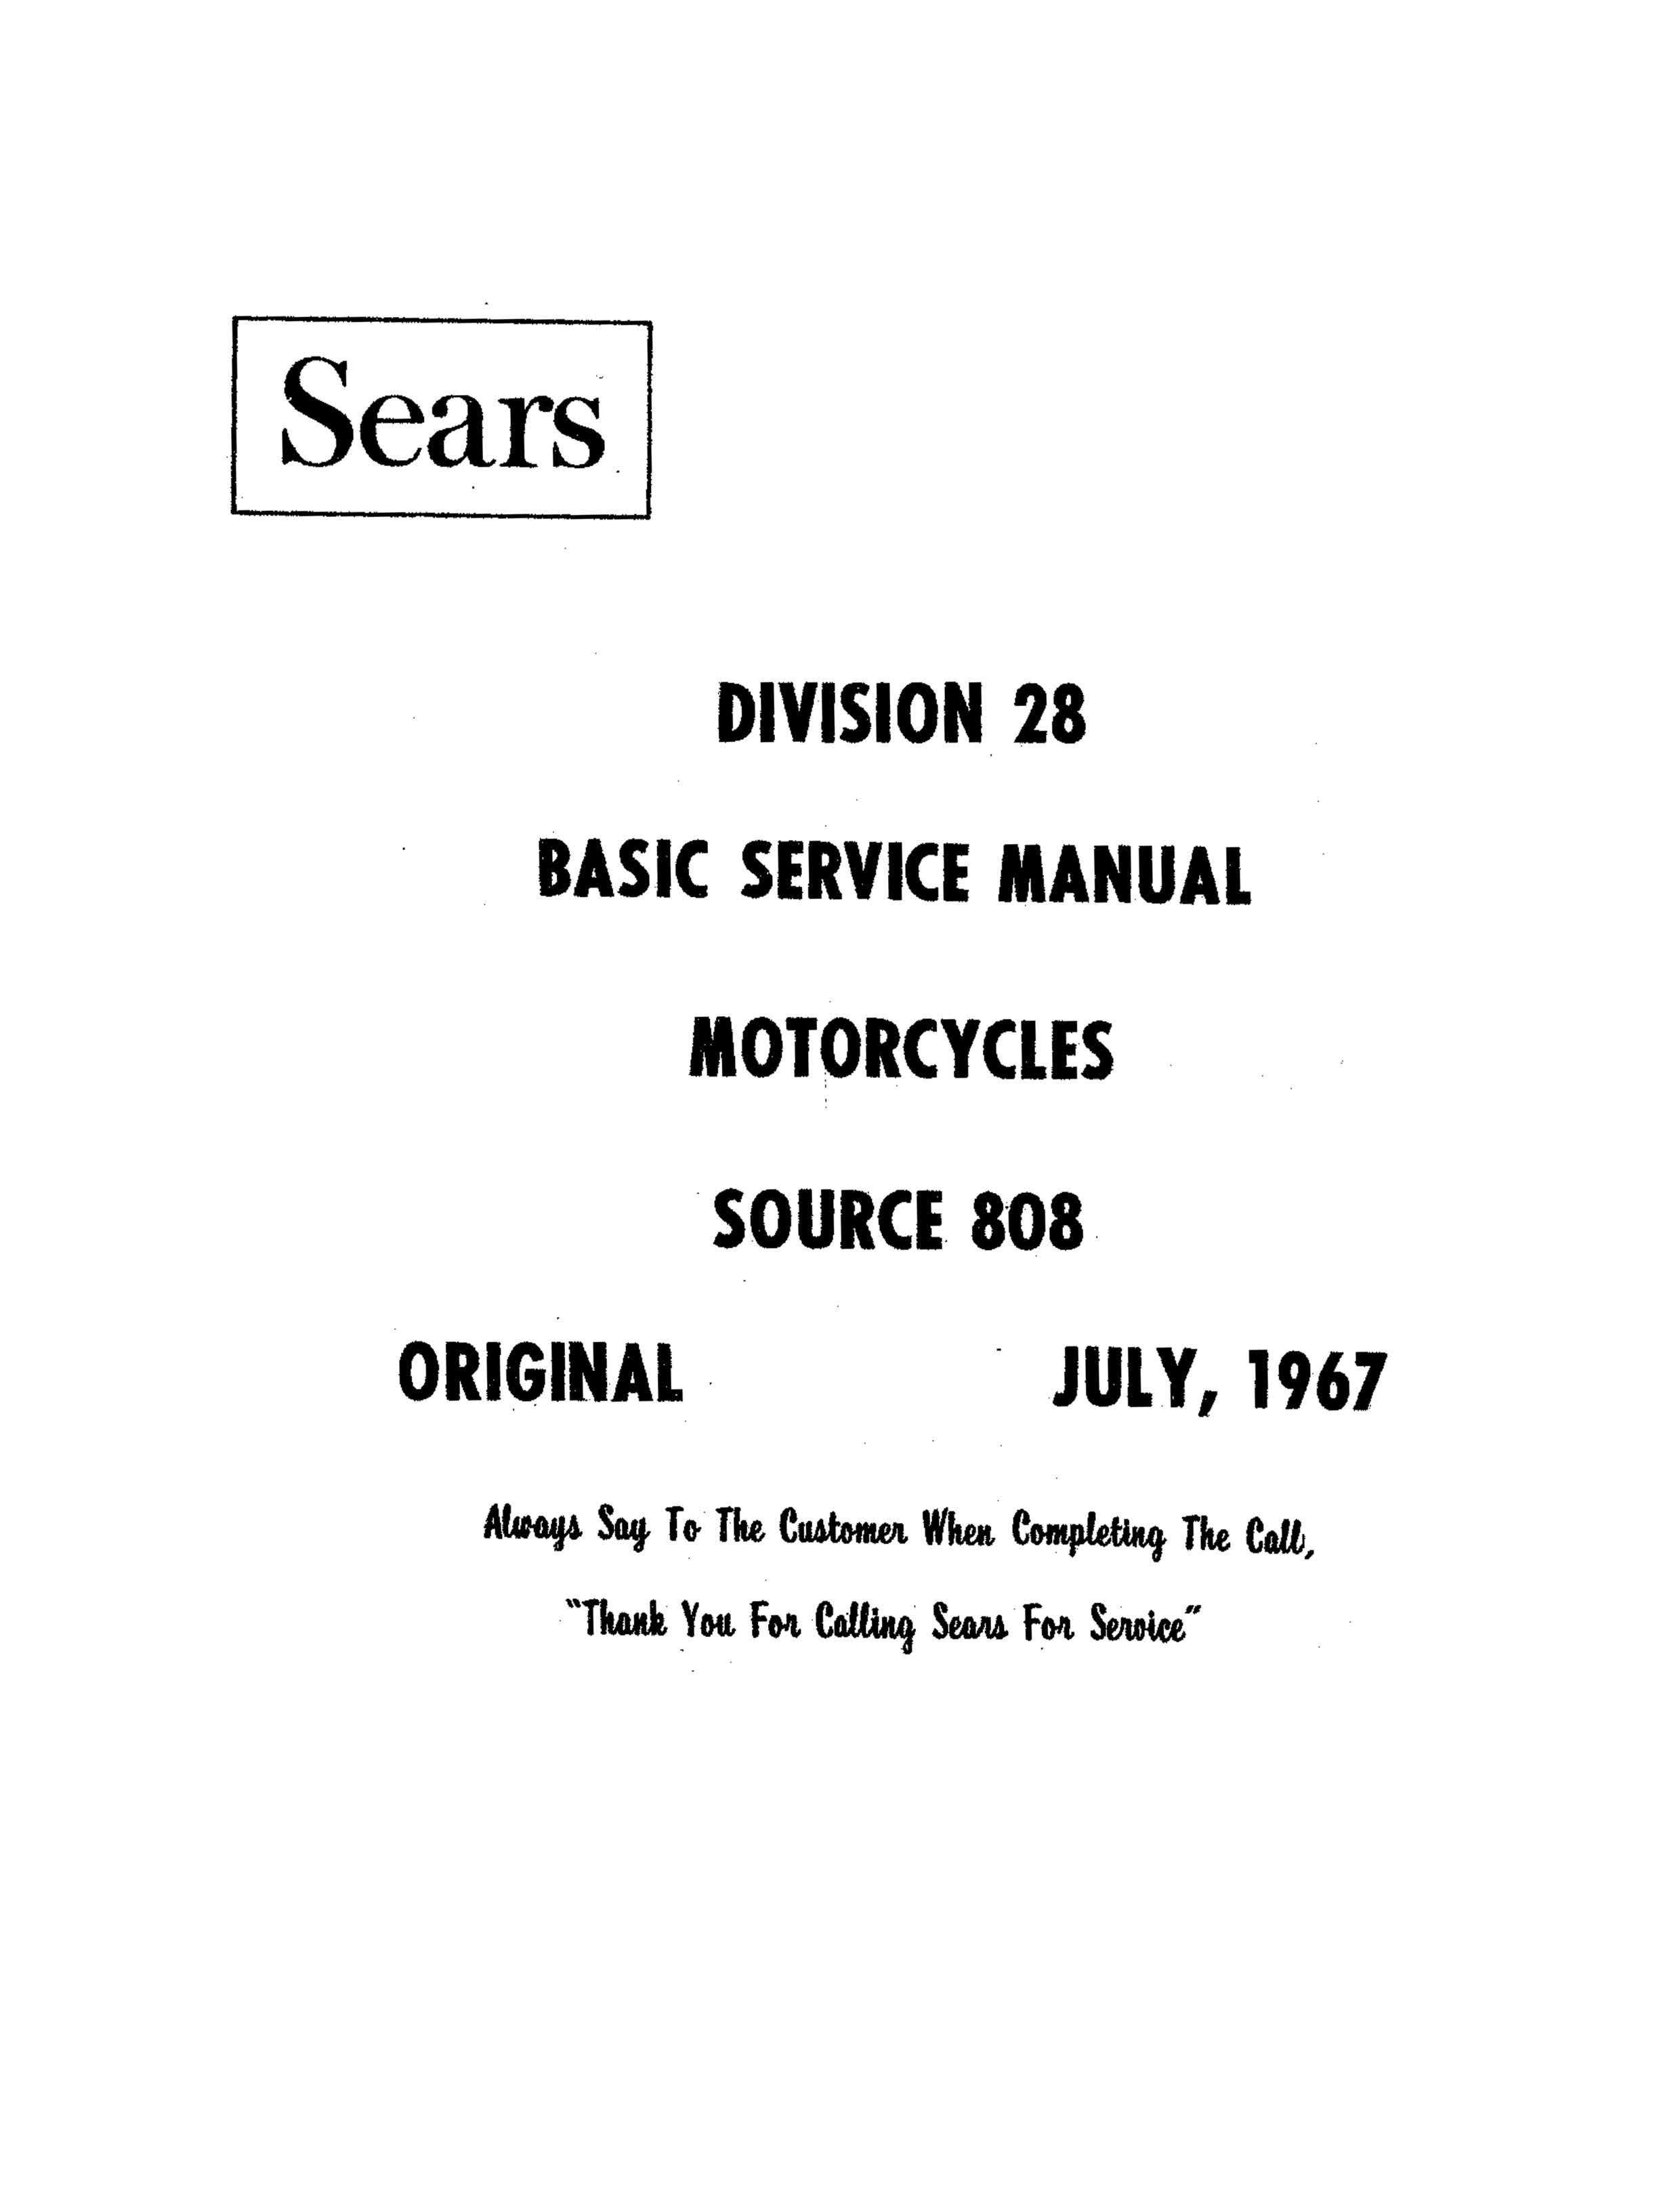 Sears 106SS Division 28 July 1967 Basic Service Manual